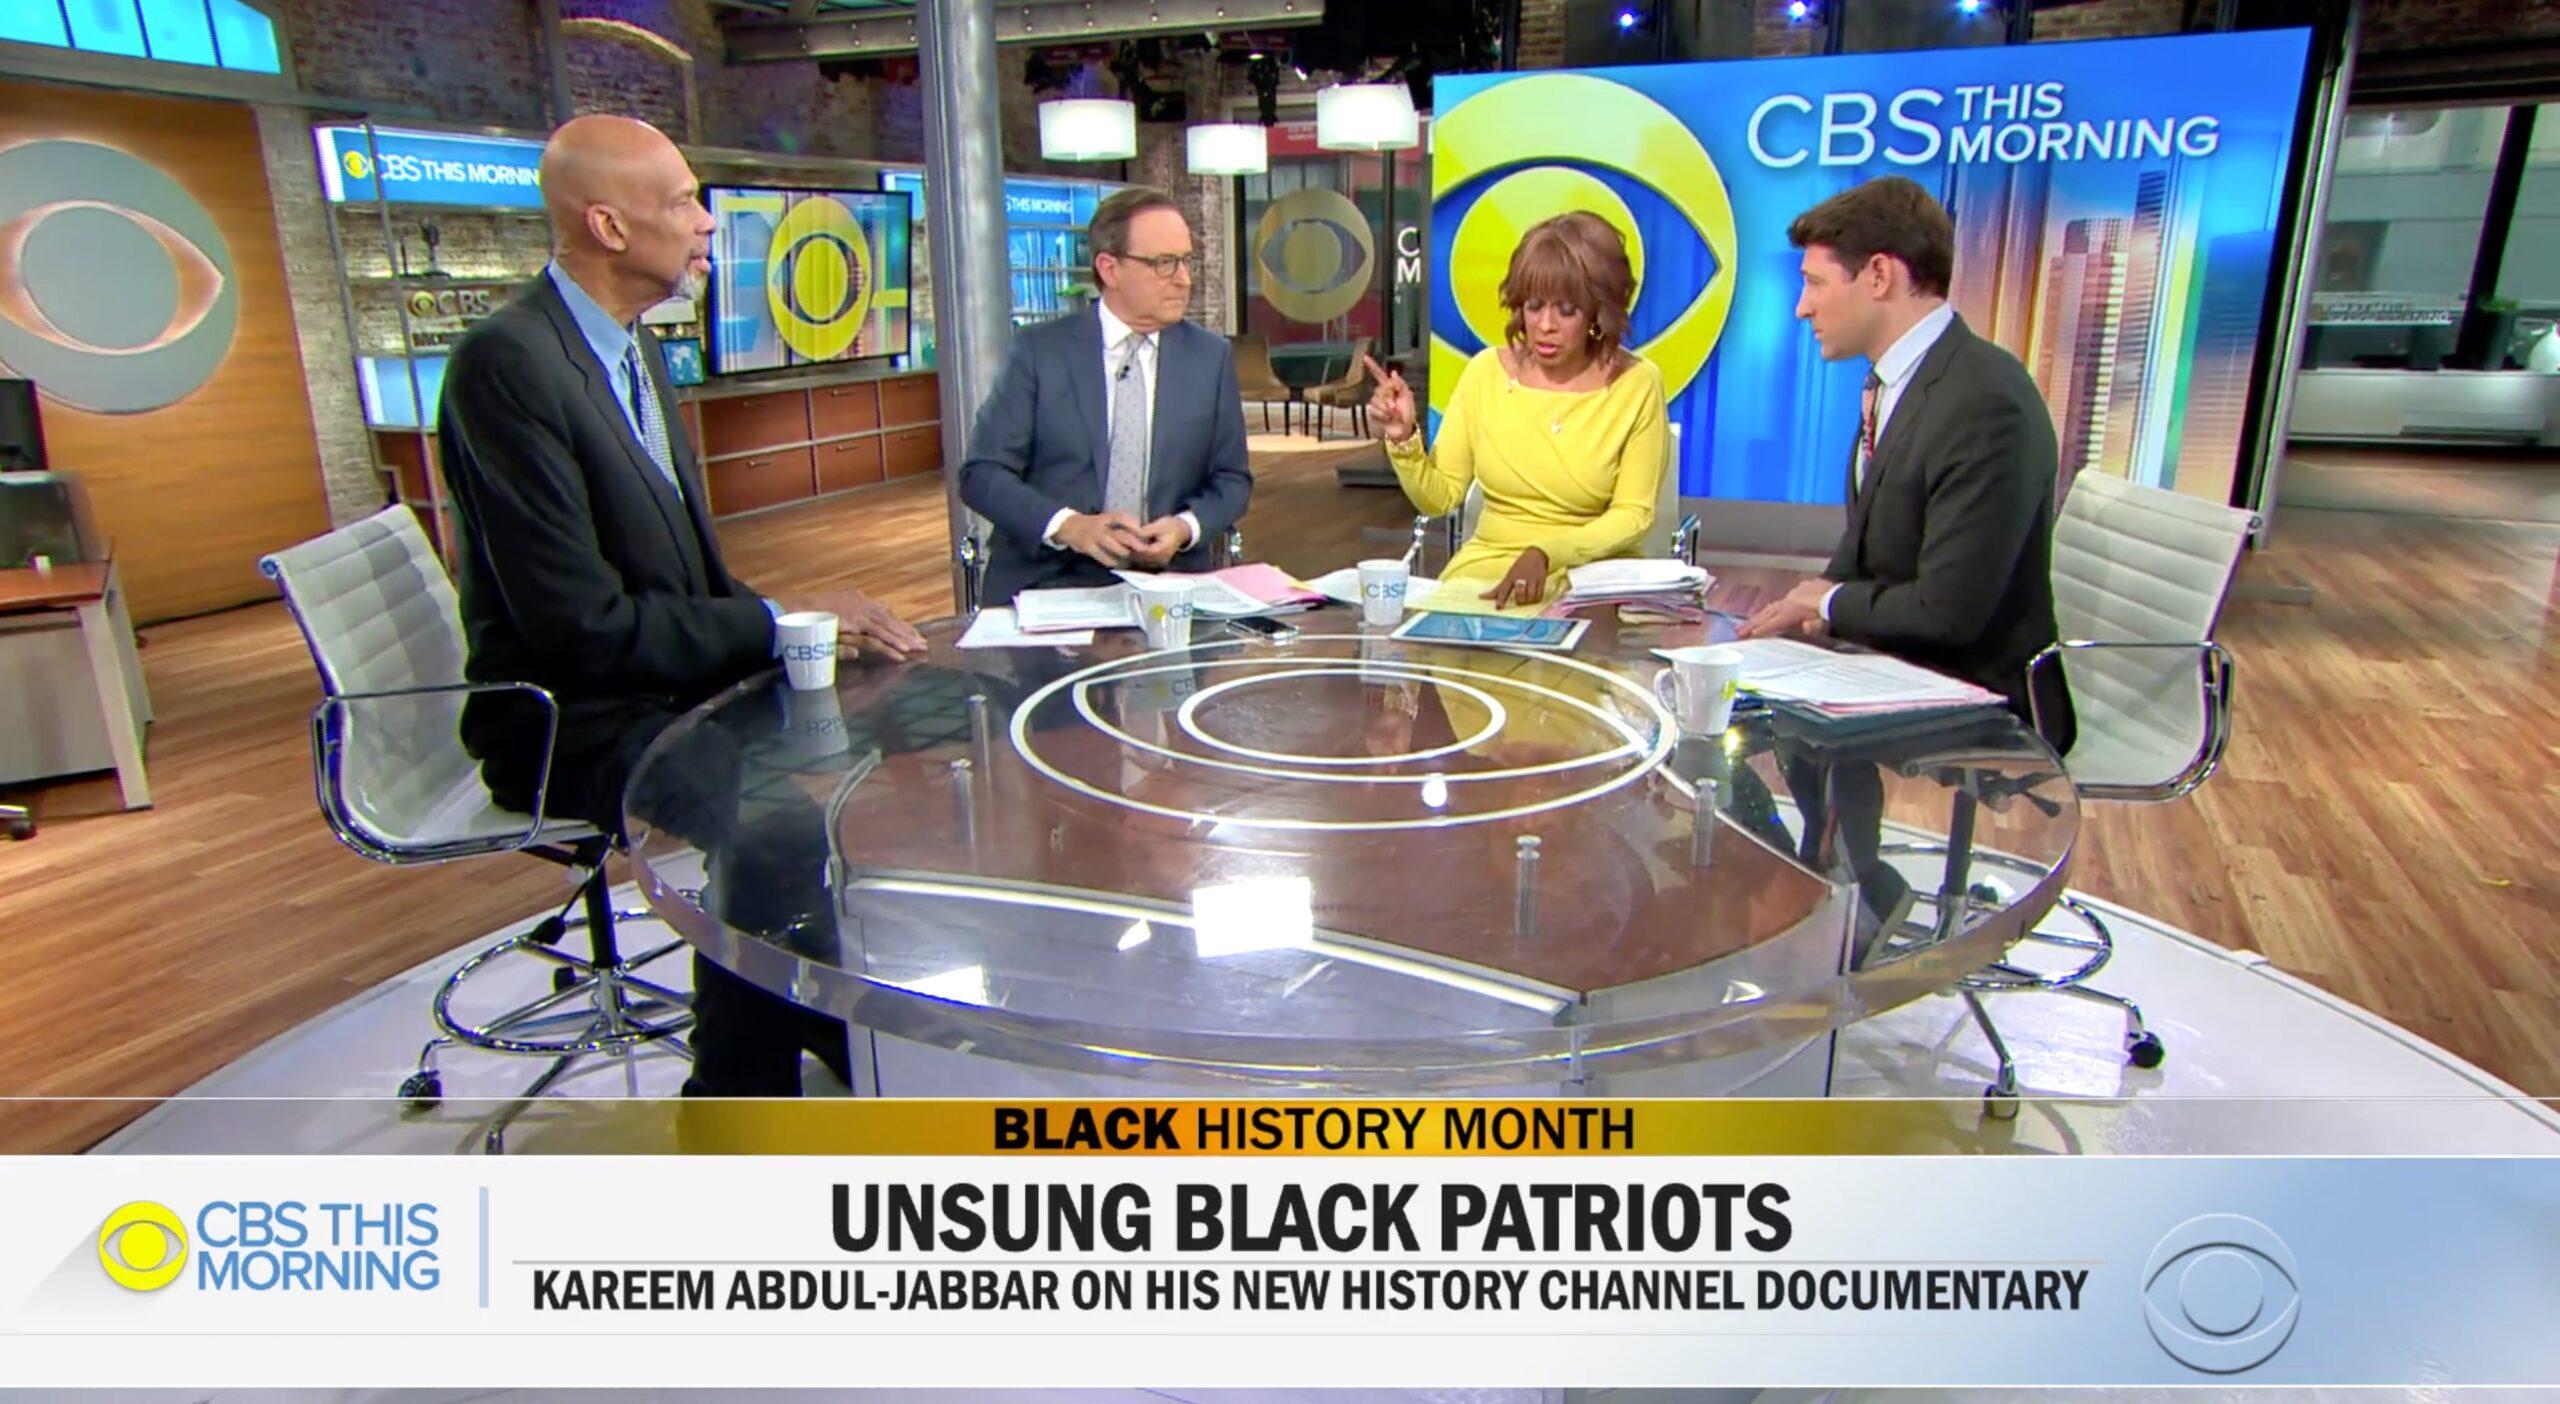 Kareem on CBS This Morning Discussing Black Patriots Documentary